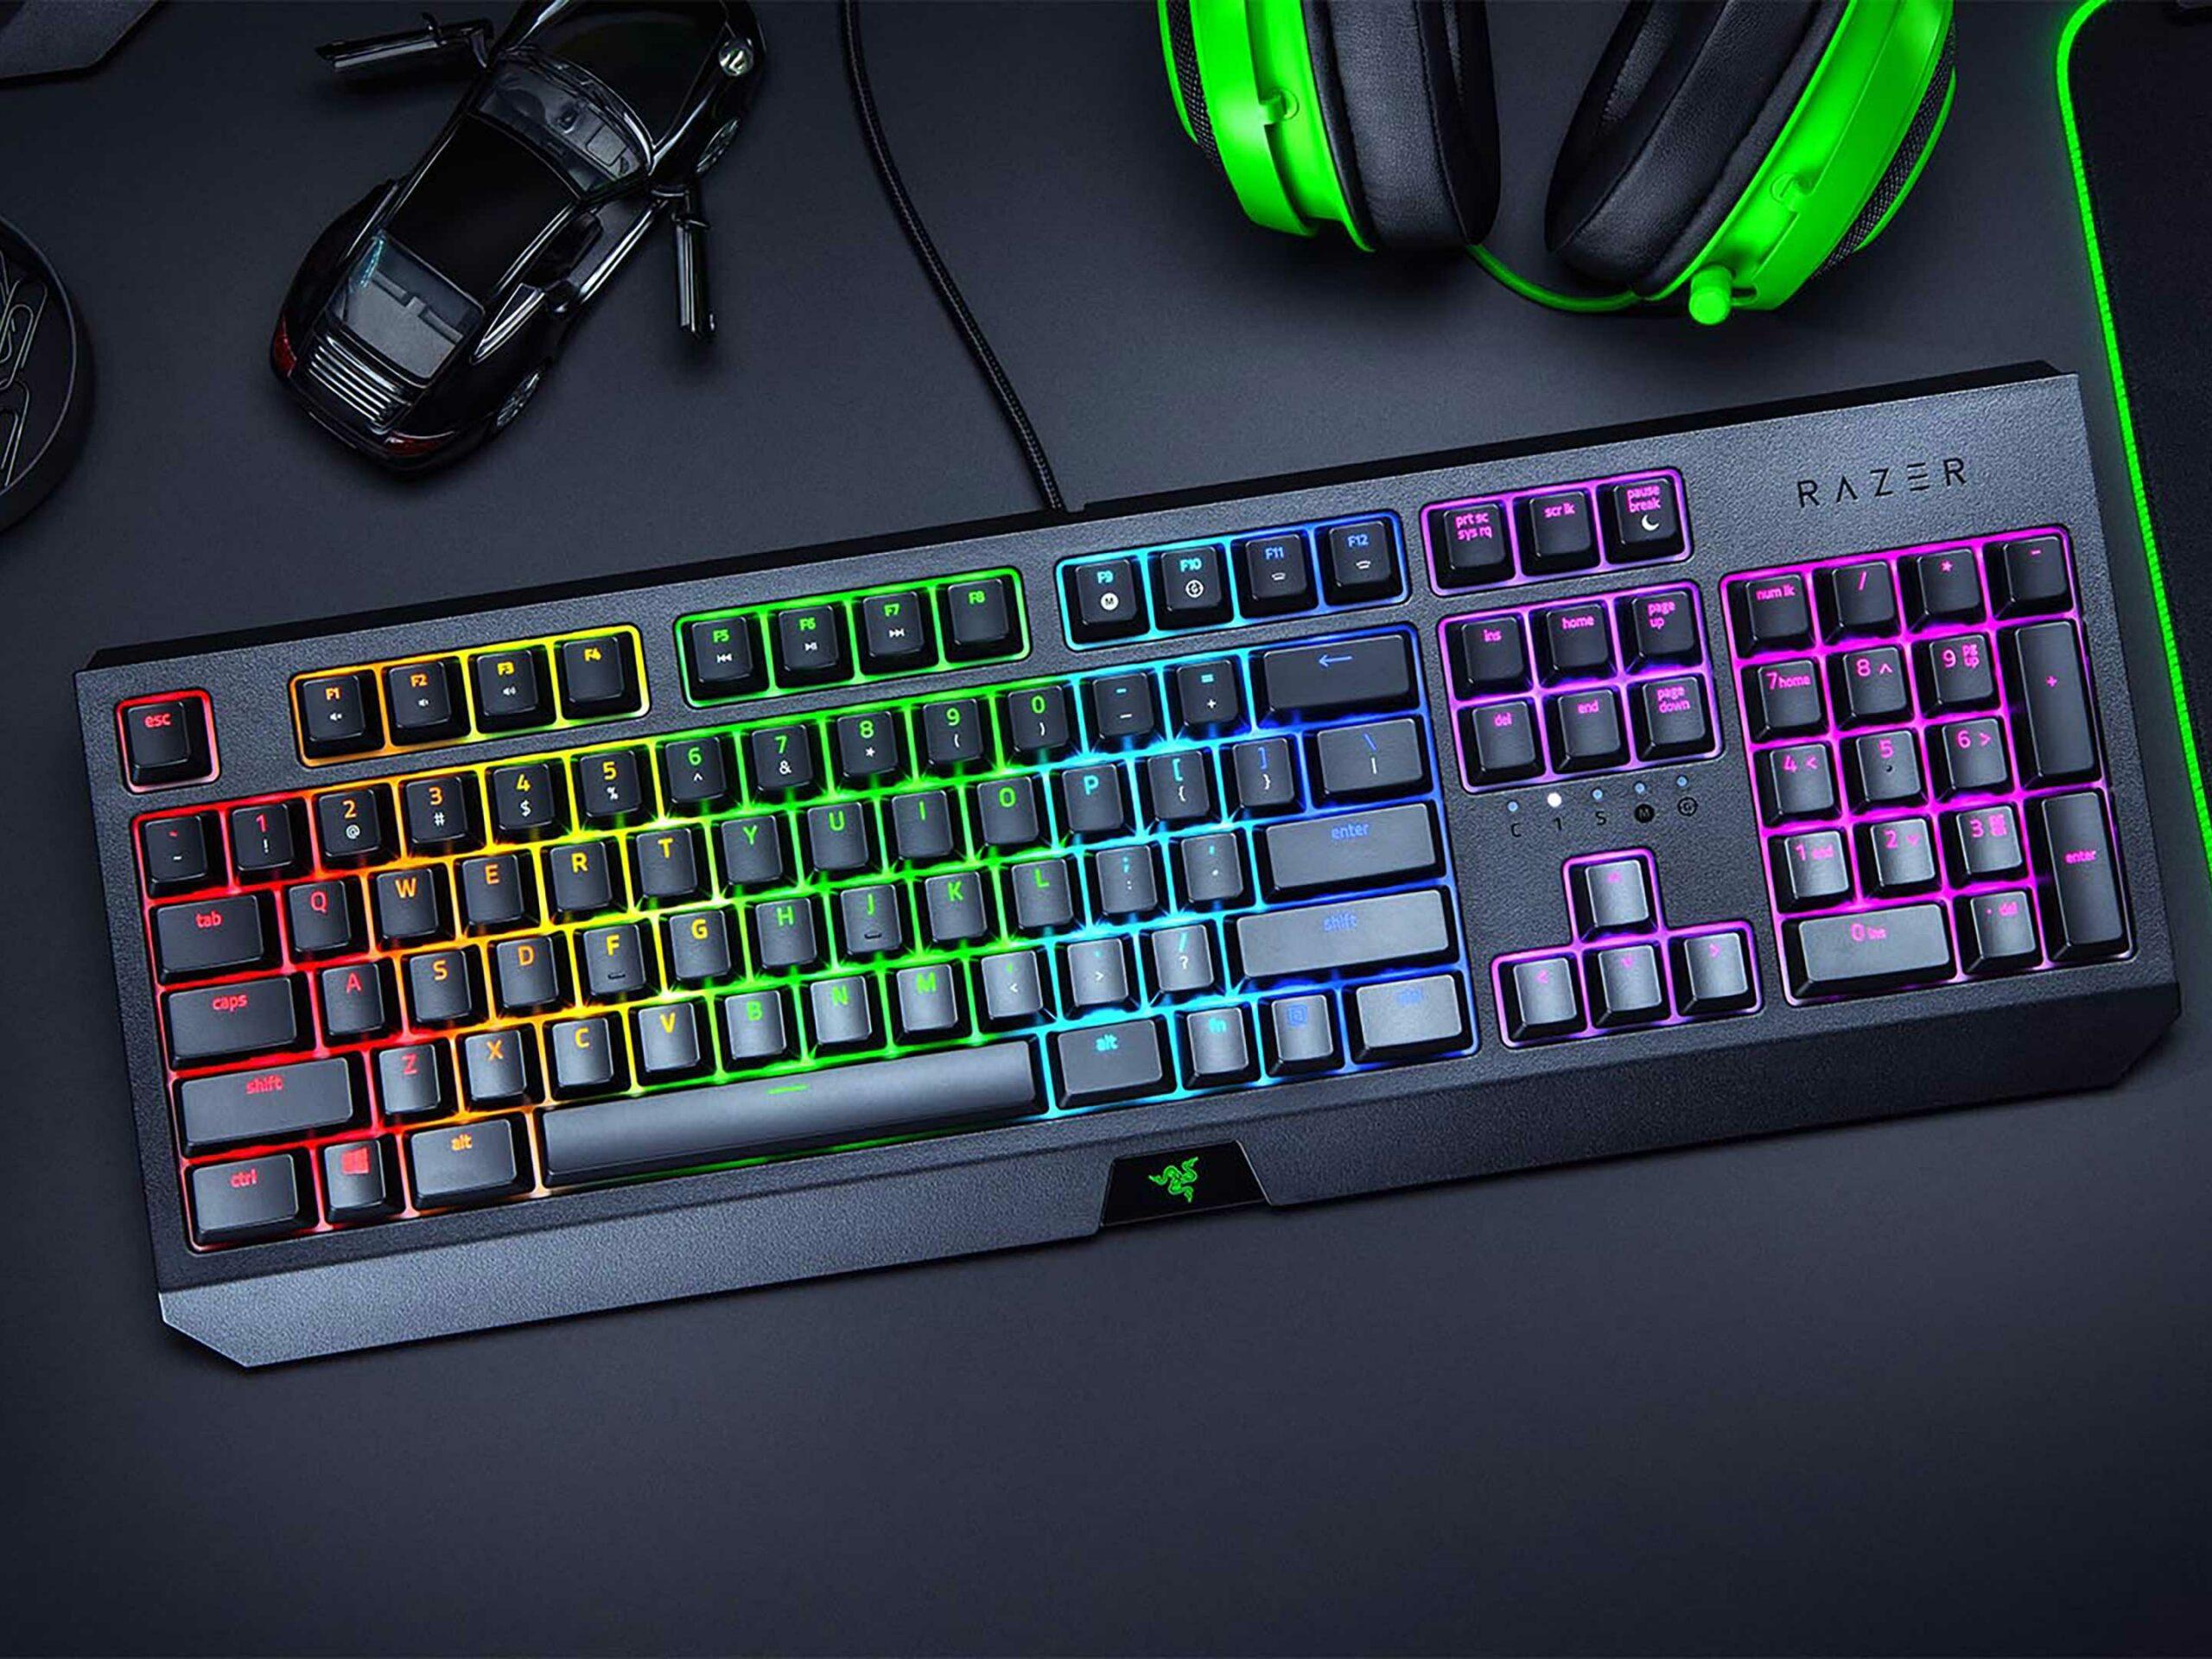 Razer Blackwidow Elite Mechanical Gaming Keybard